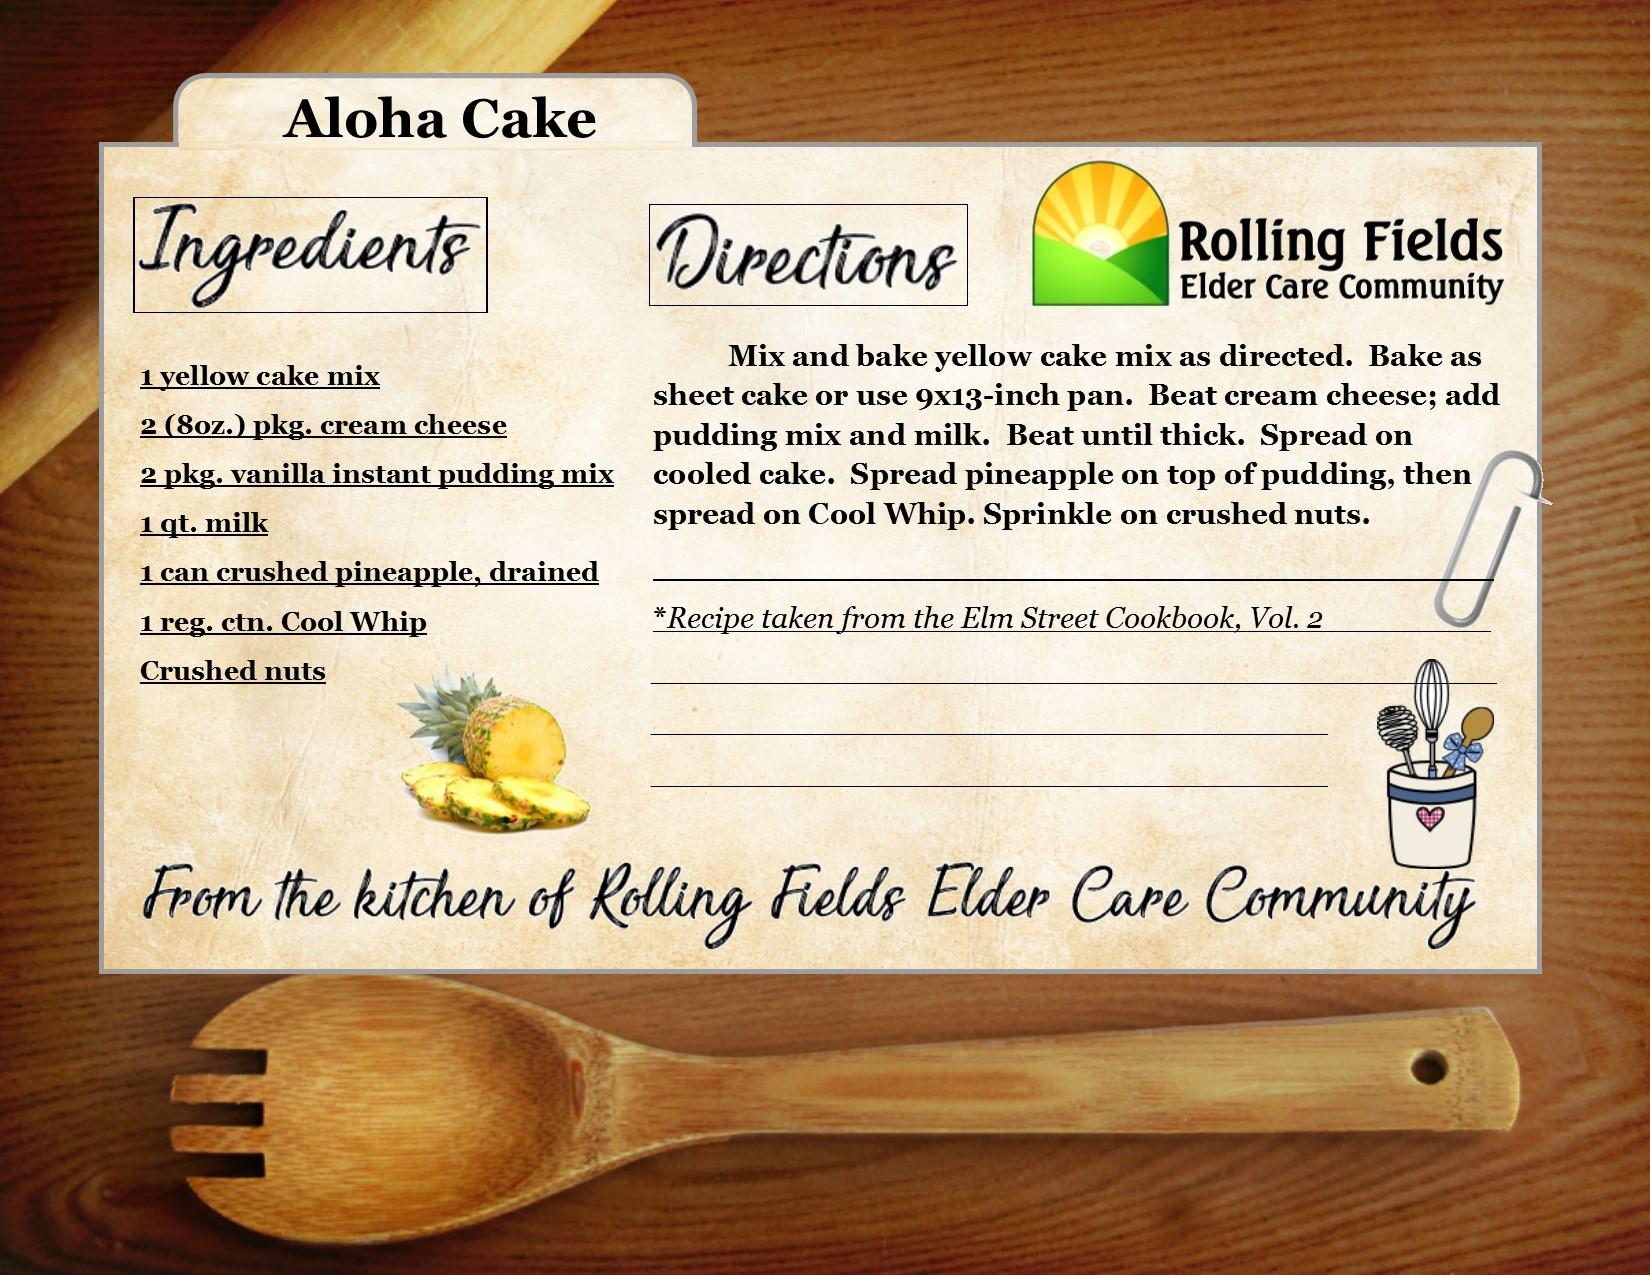 rollingfieldsrecipeseldercarenursinghomeAloha Cake.jpg